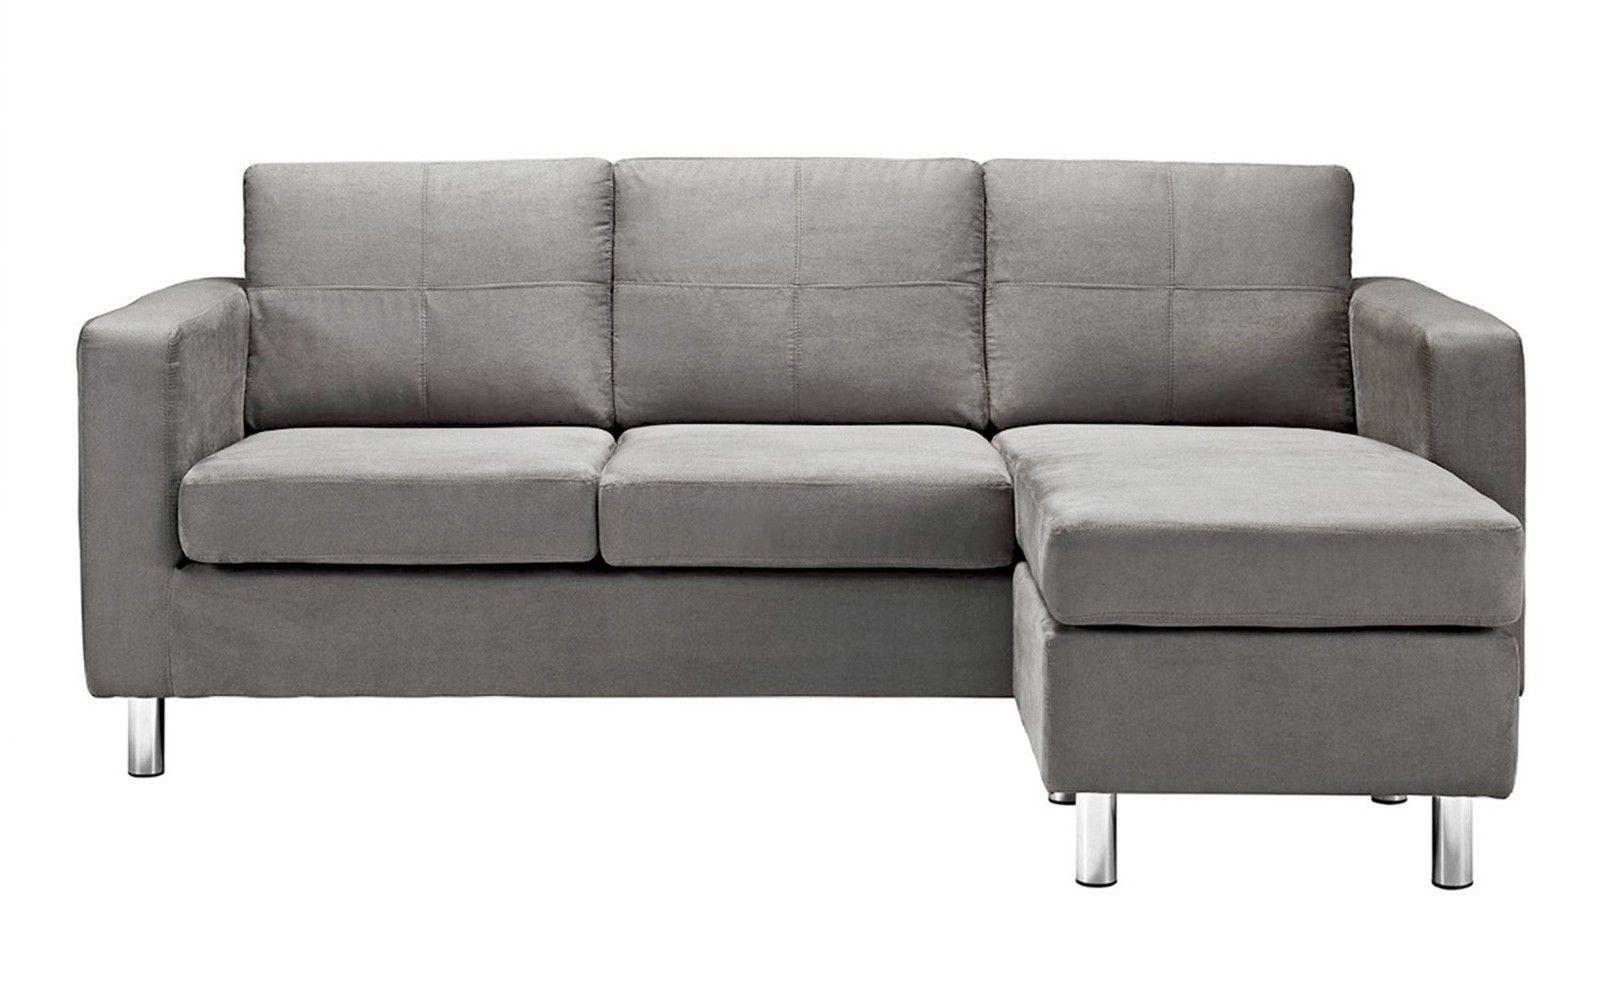 Bon Metro Modern Reversible Small Bonded Leather Sectional